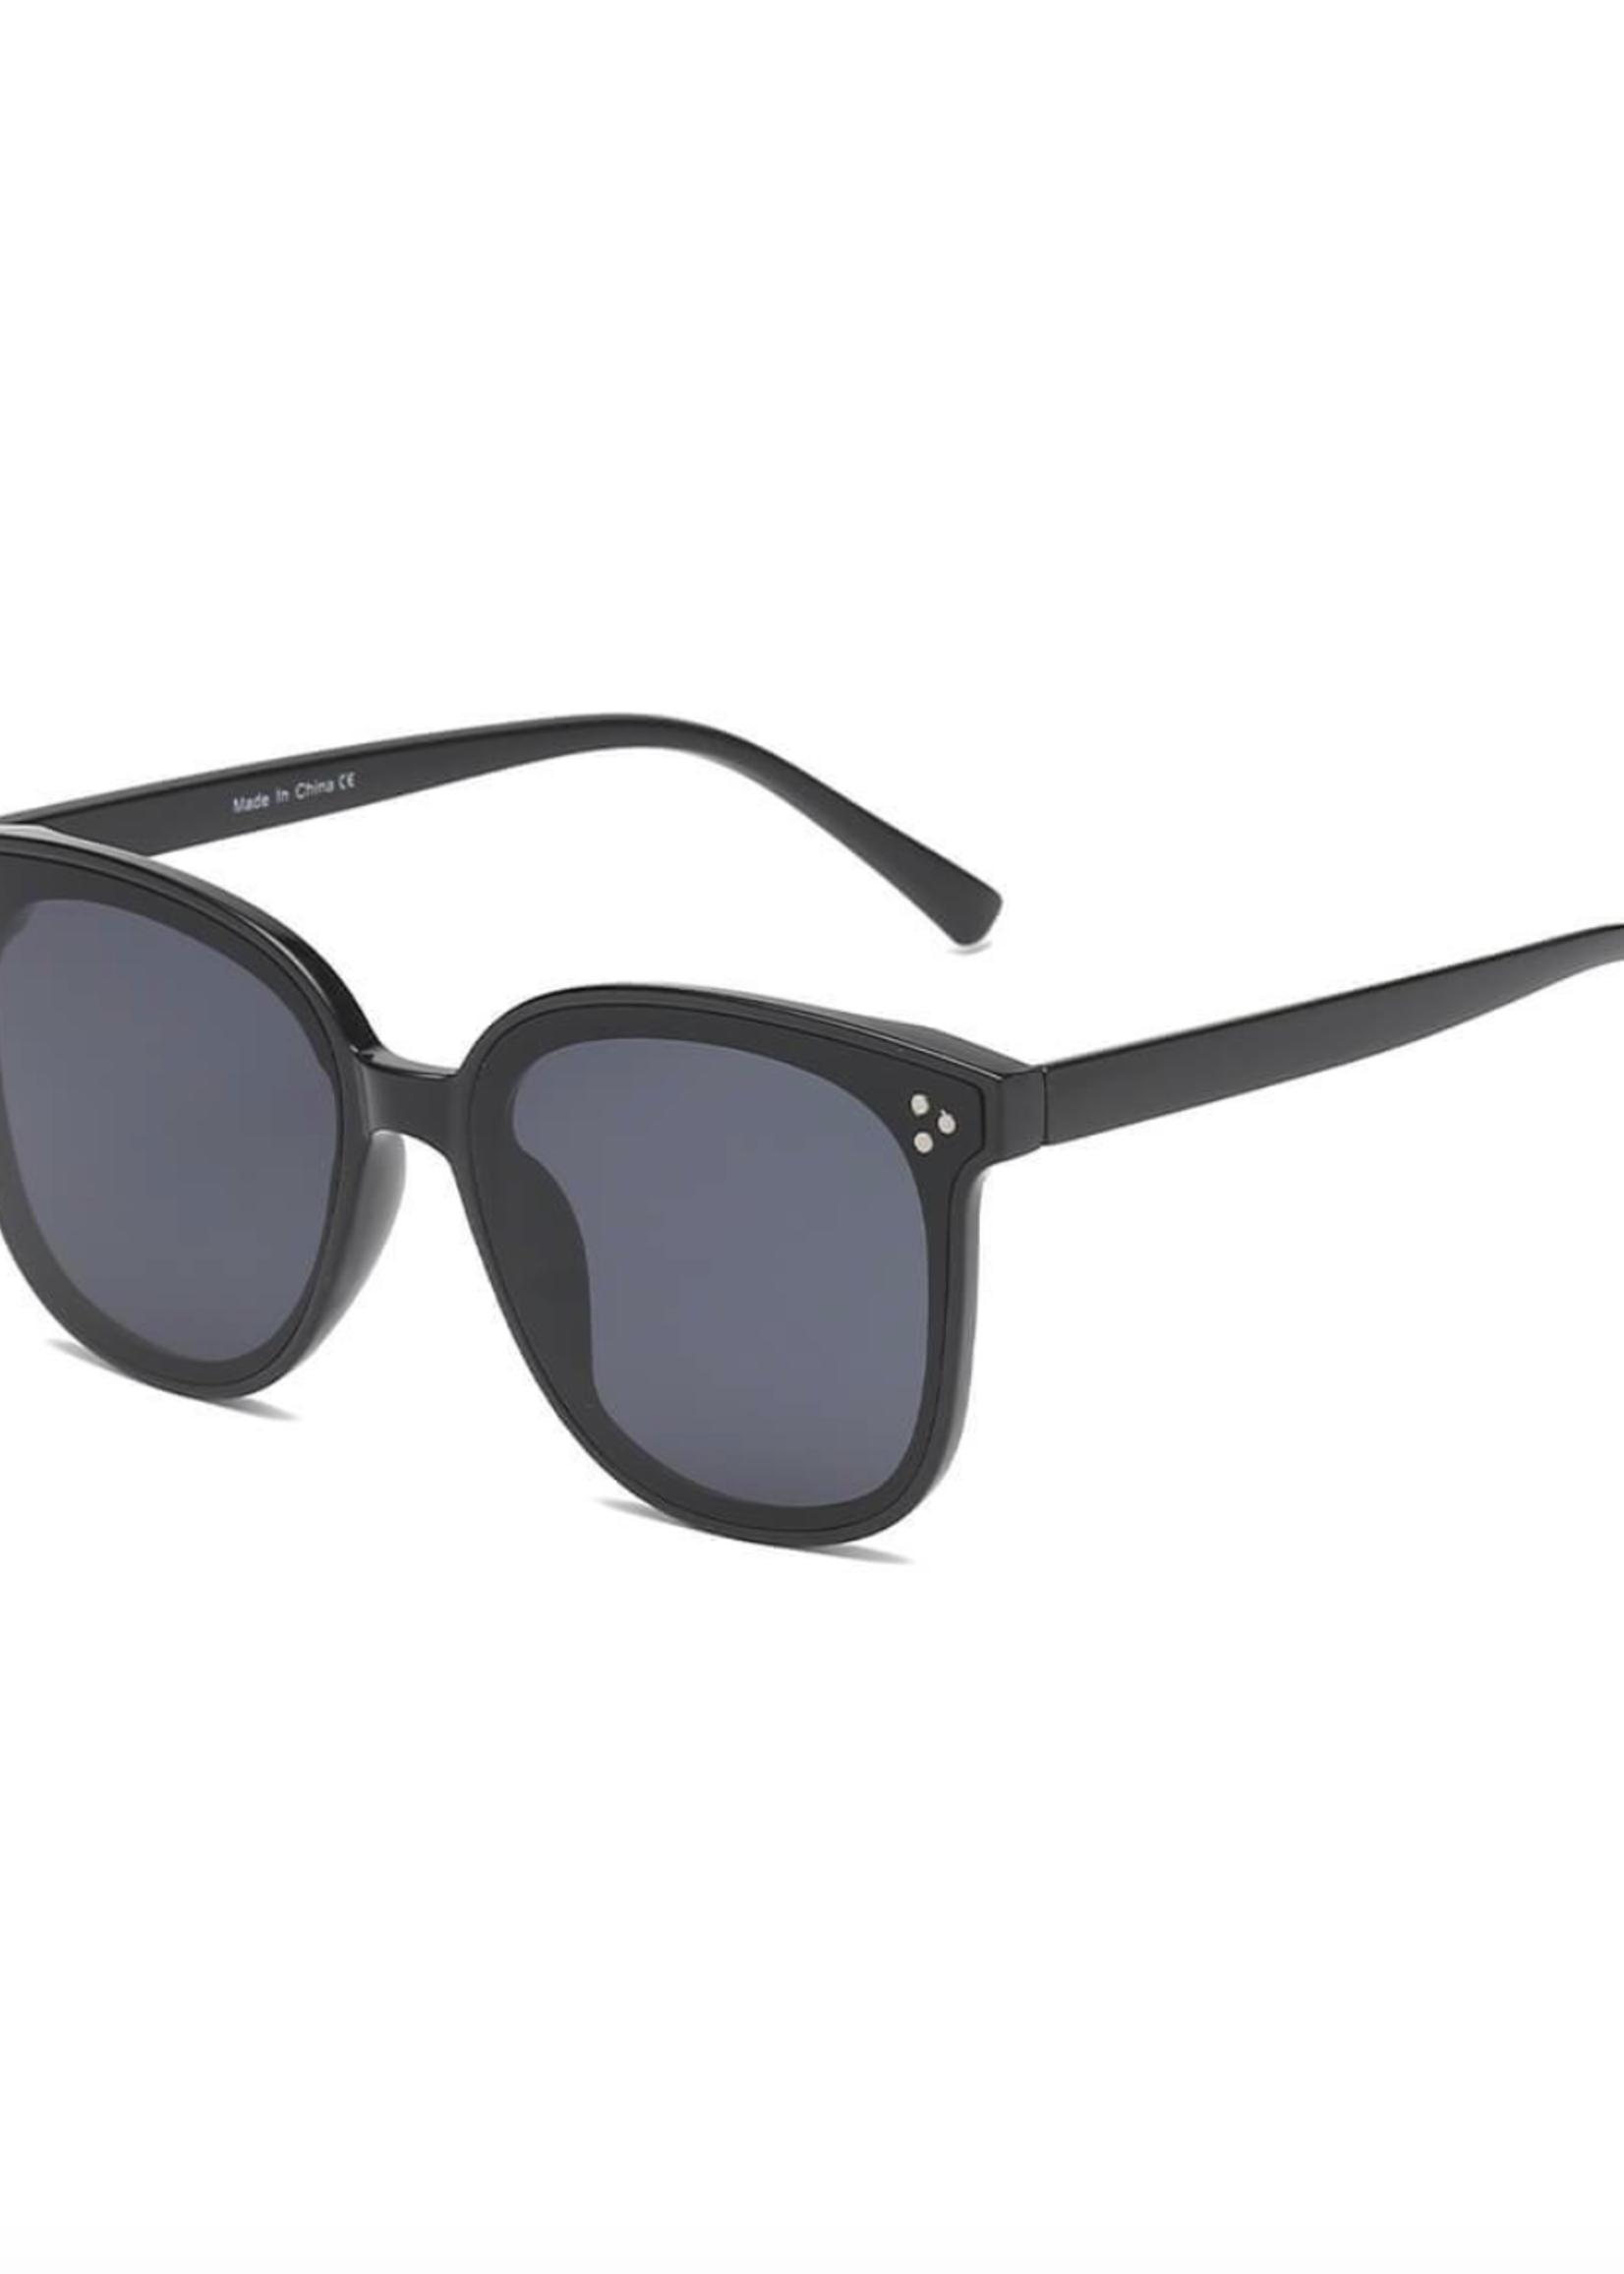 August Avenue Eyewear Paris | Square Cat Eye Sunglasses